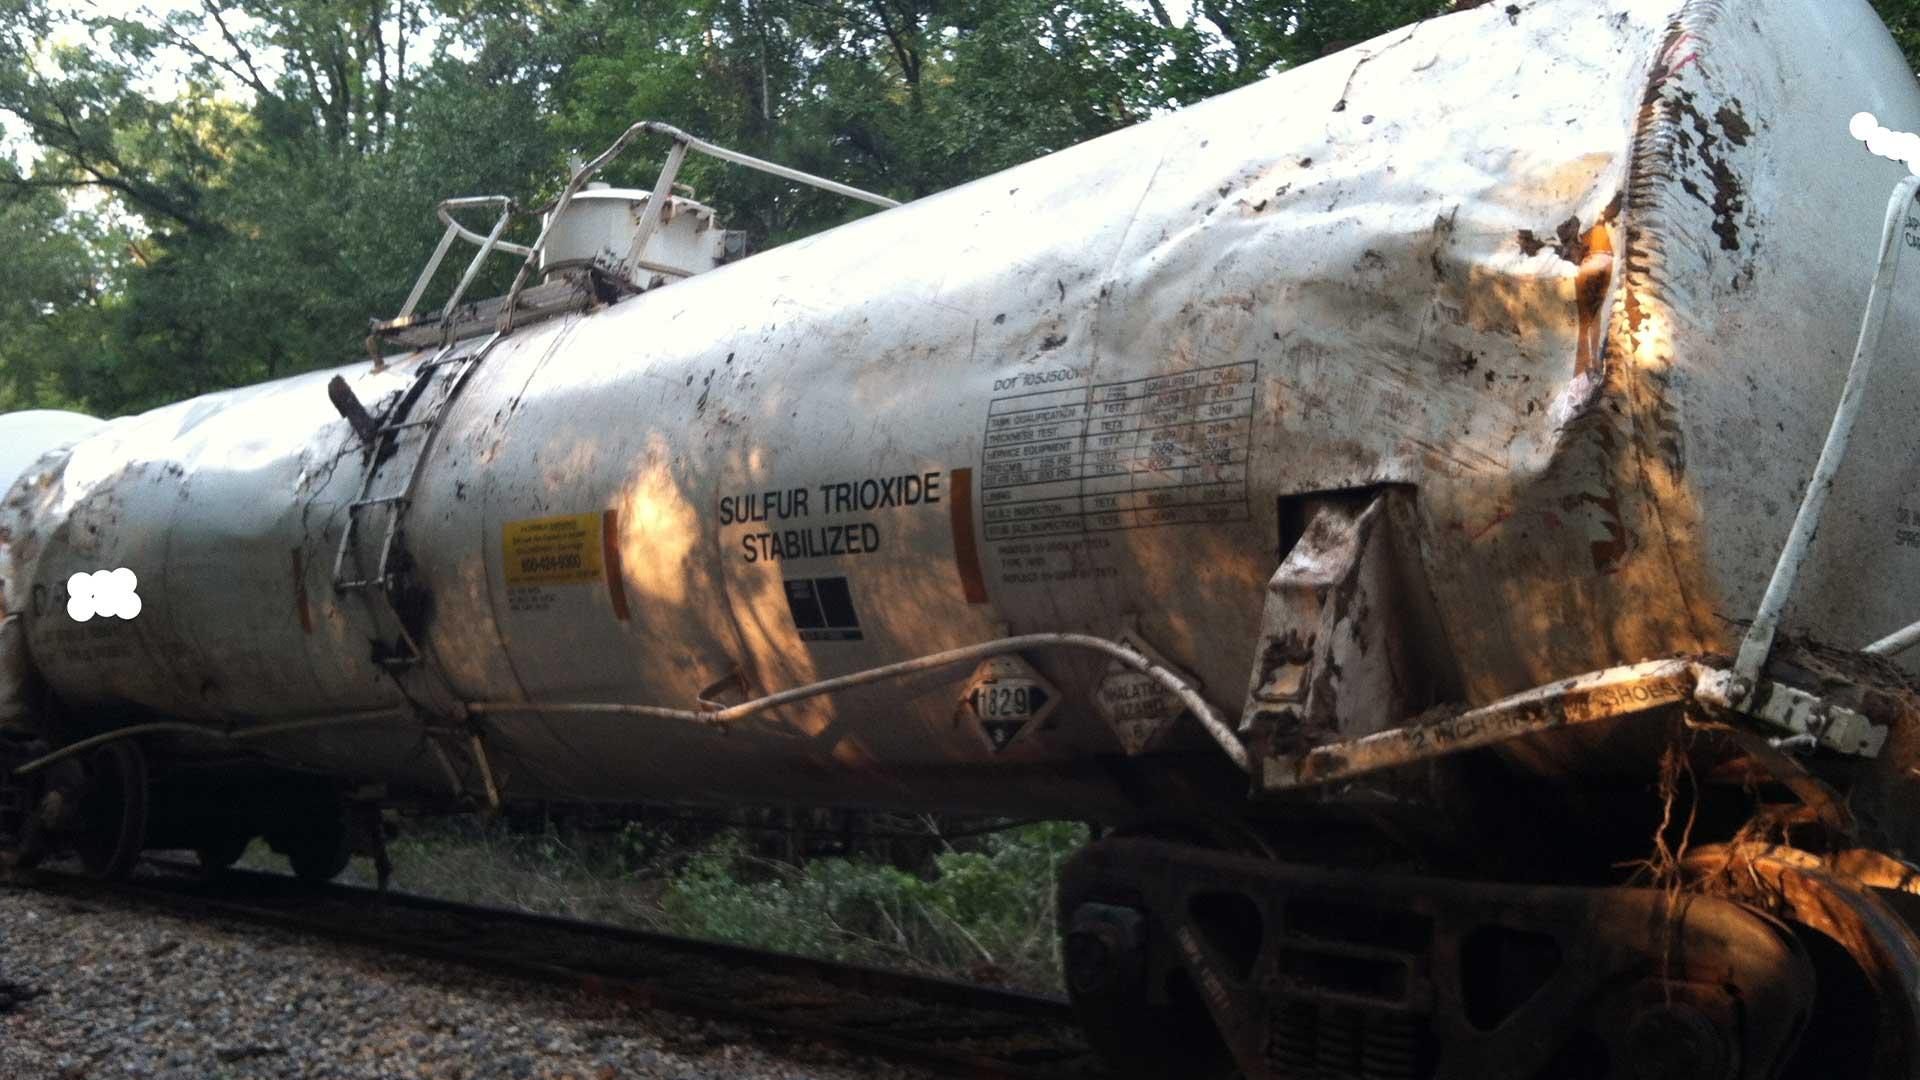 sulfur trioxide cylinder on a railroad track